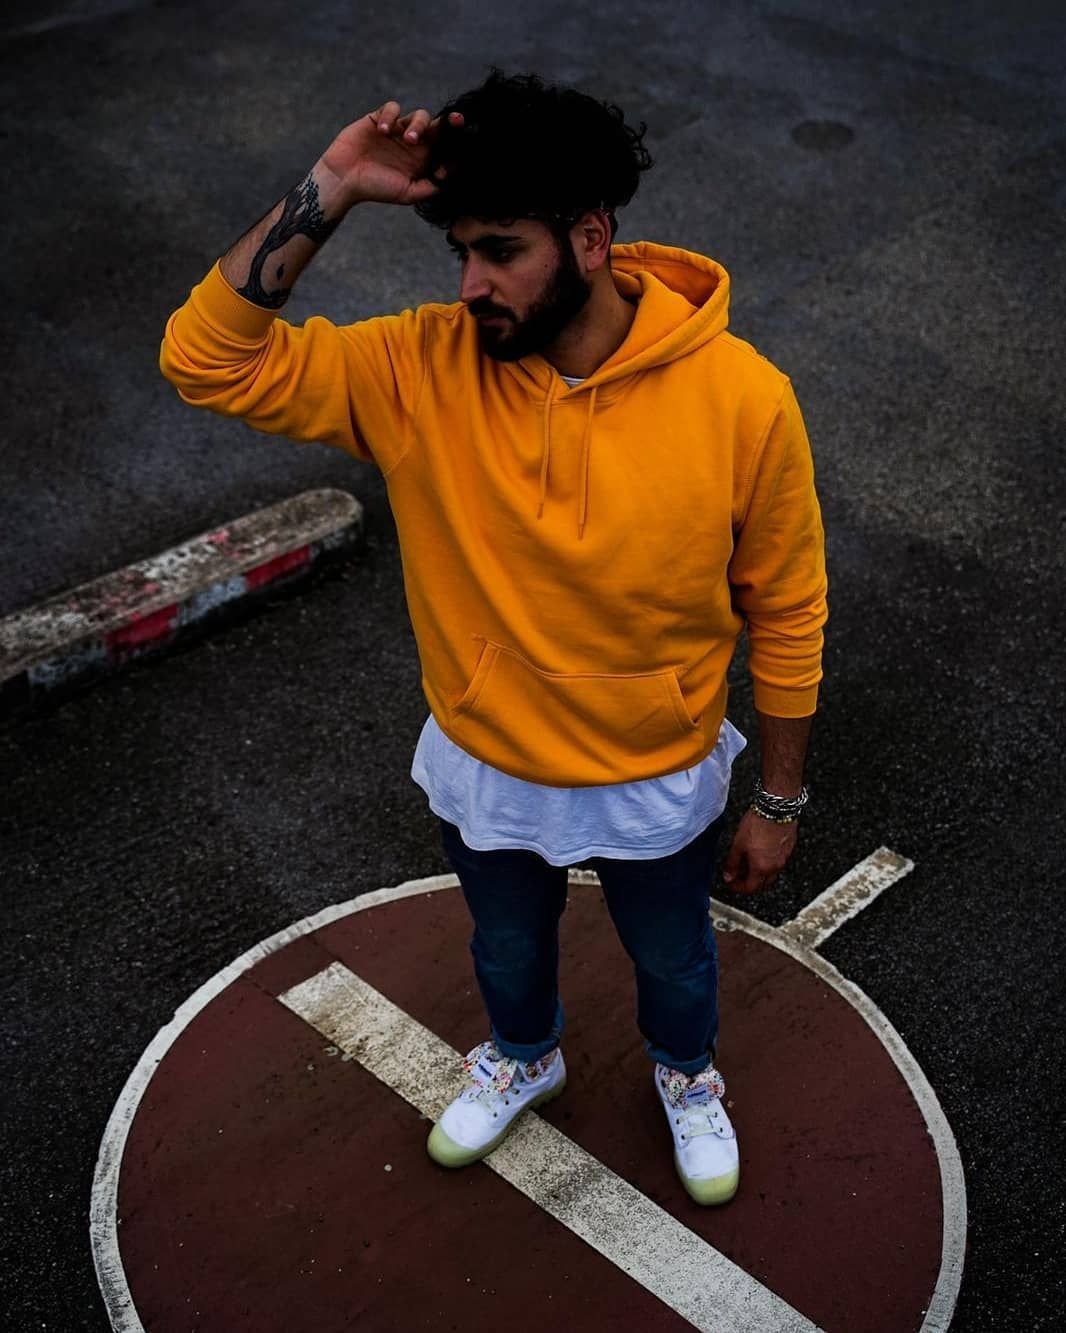 ehrenfeld hiphop kicks snipes nike